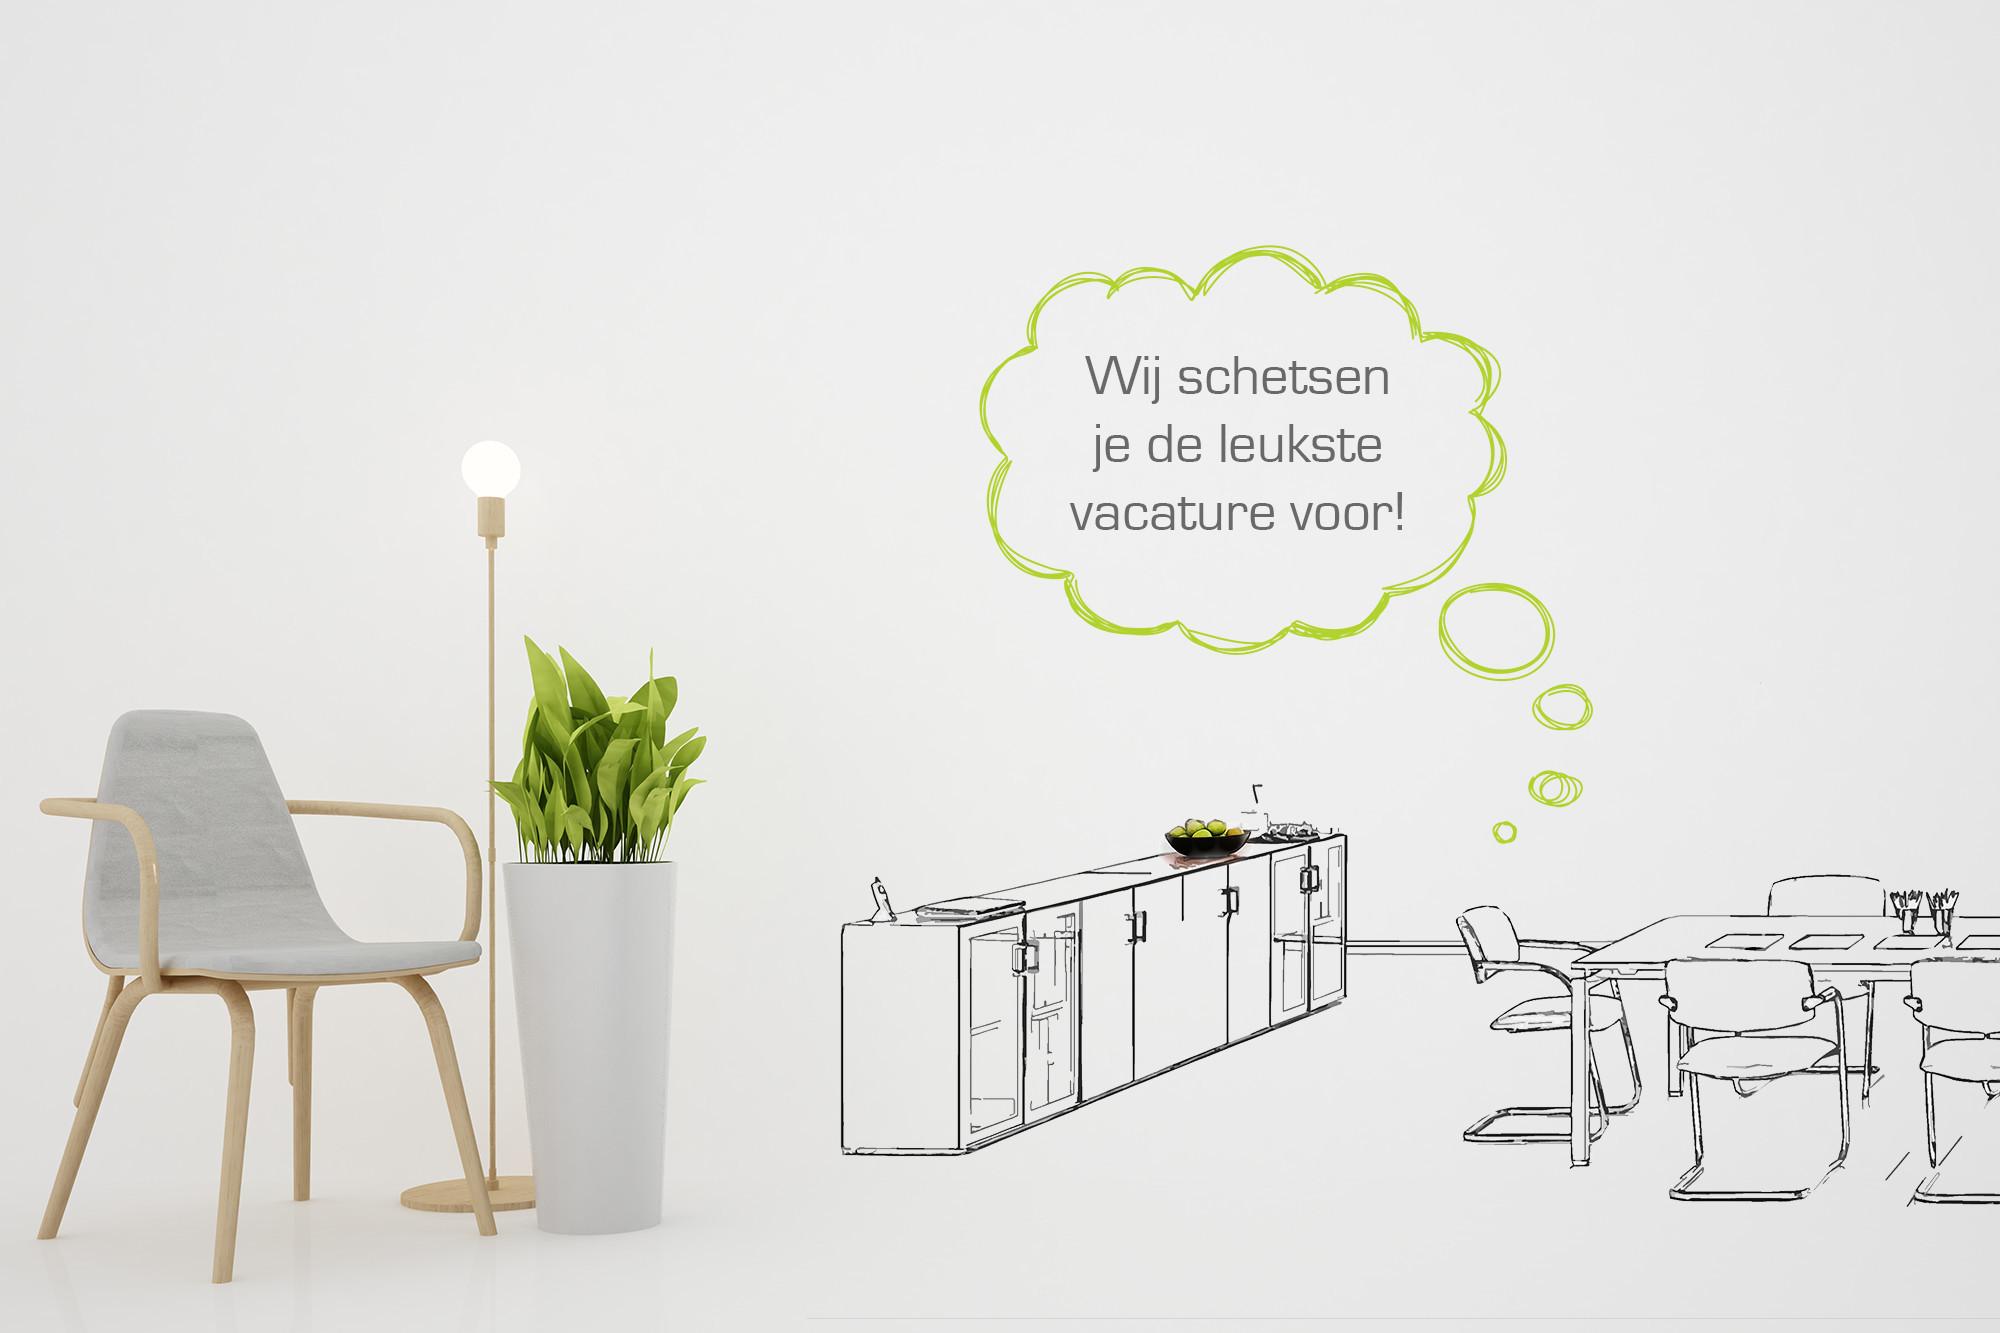 Vacature - Griffioeninvorm - Interieur & Expo